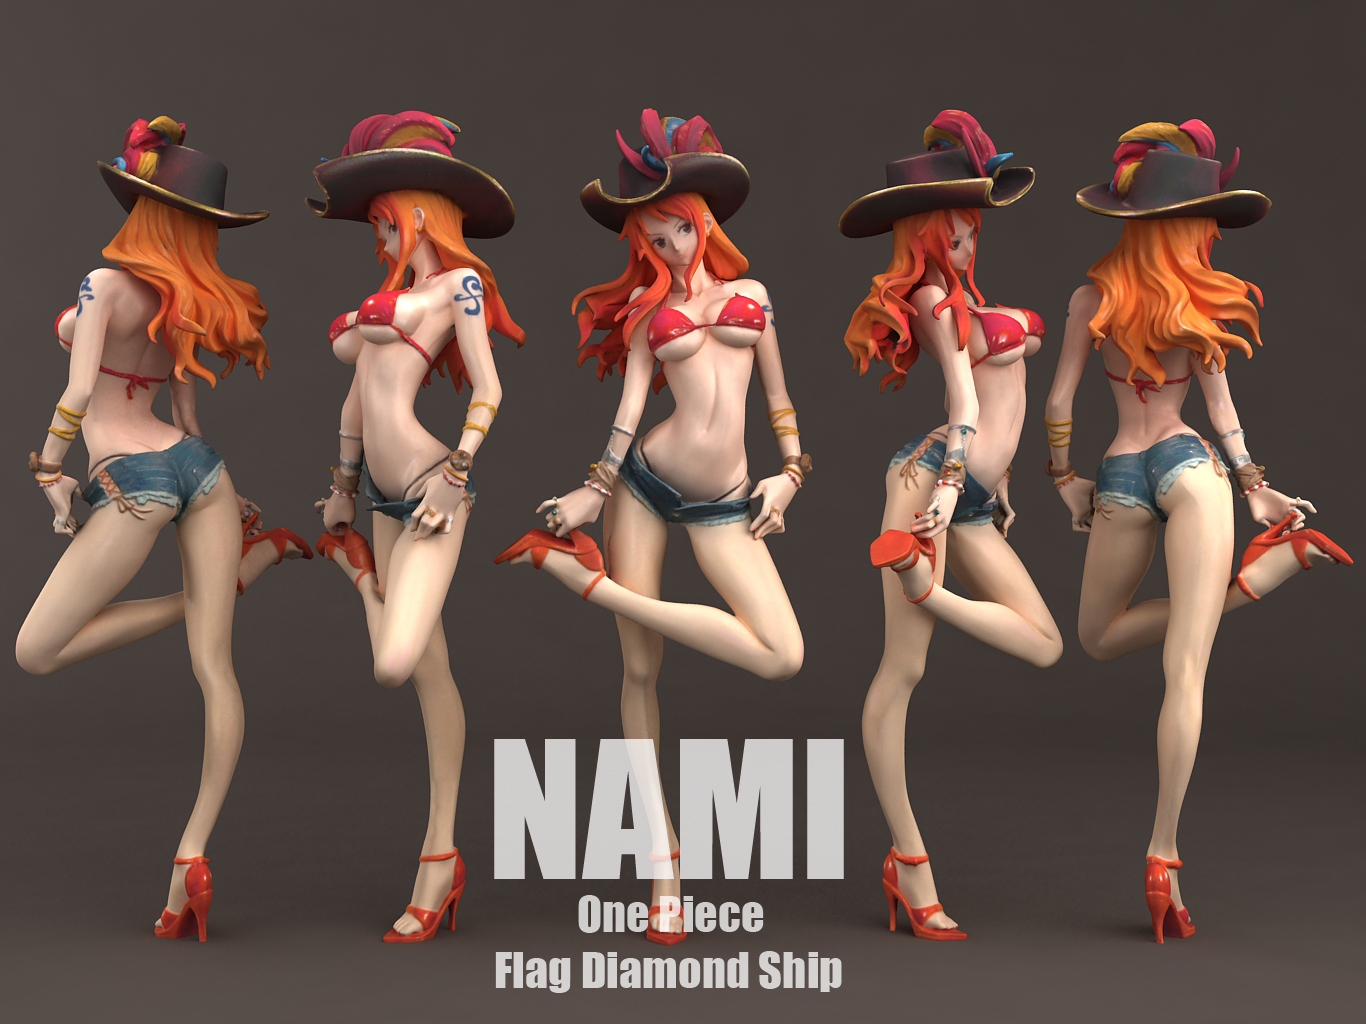 nami_0001.jpg Download STL file Nami flag diamond ship 3DScan • 3D printable model, blueday66